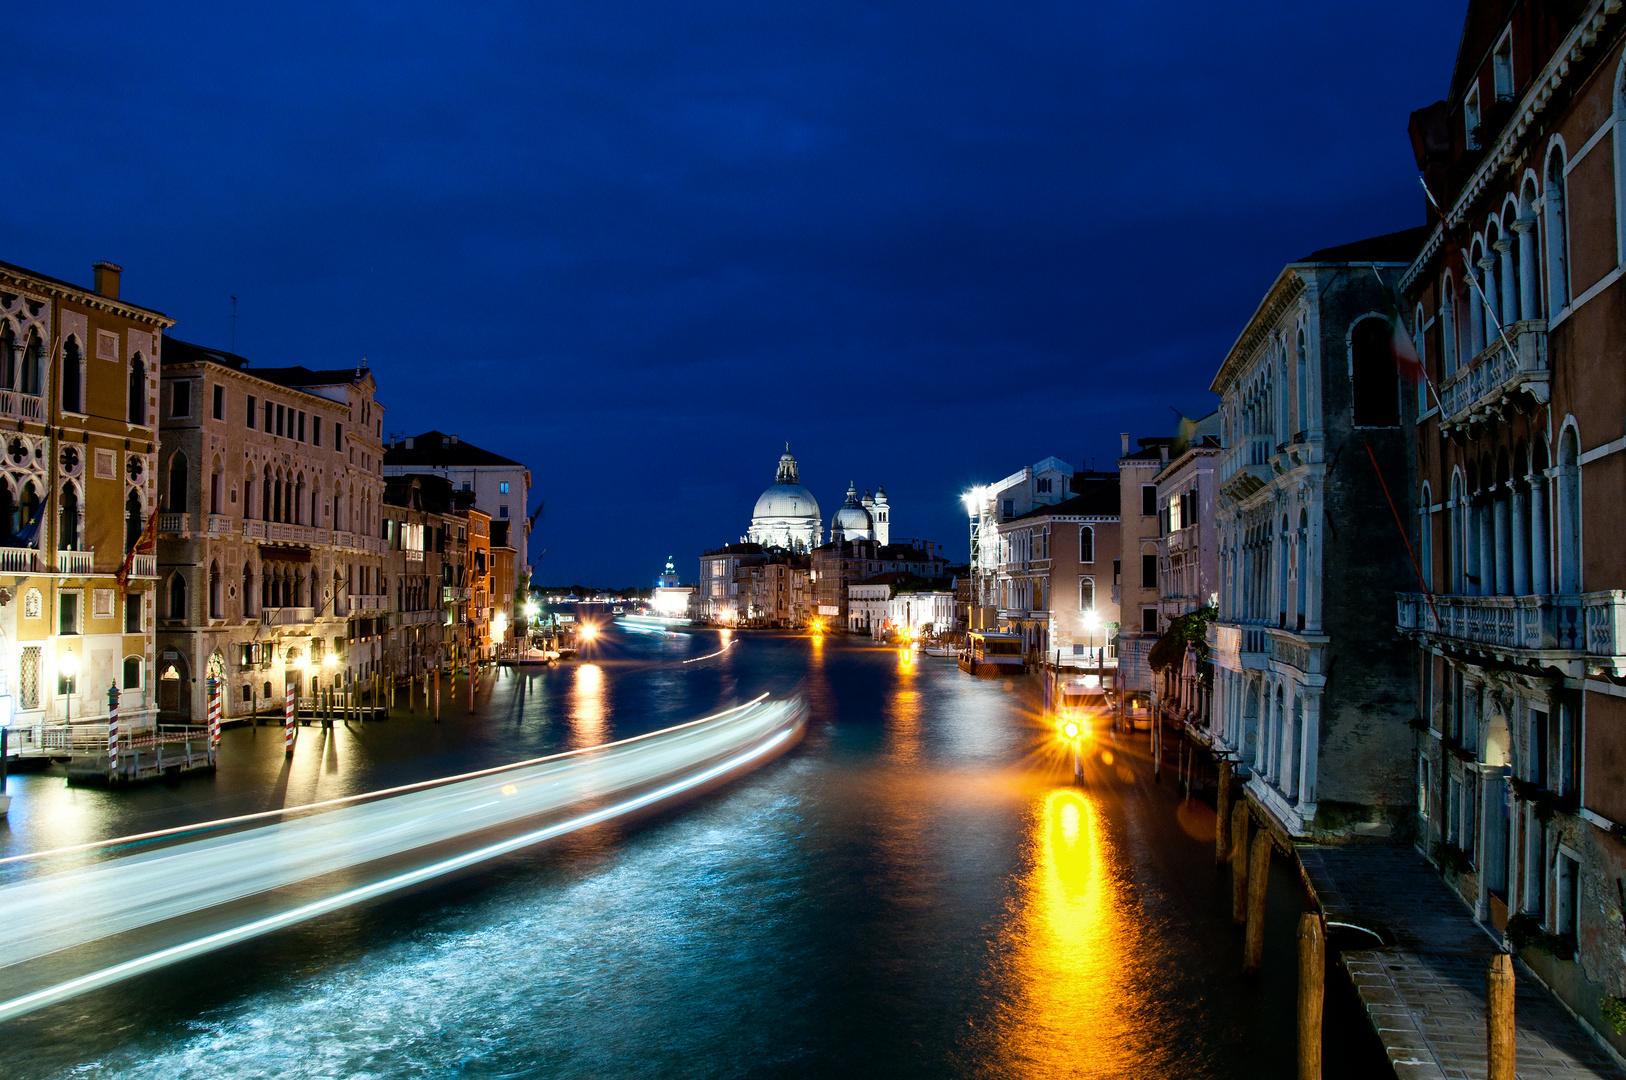 Venedig bei Nacht 2